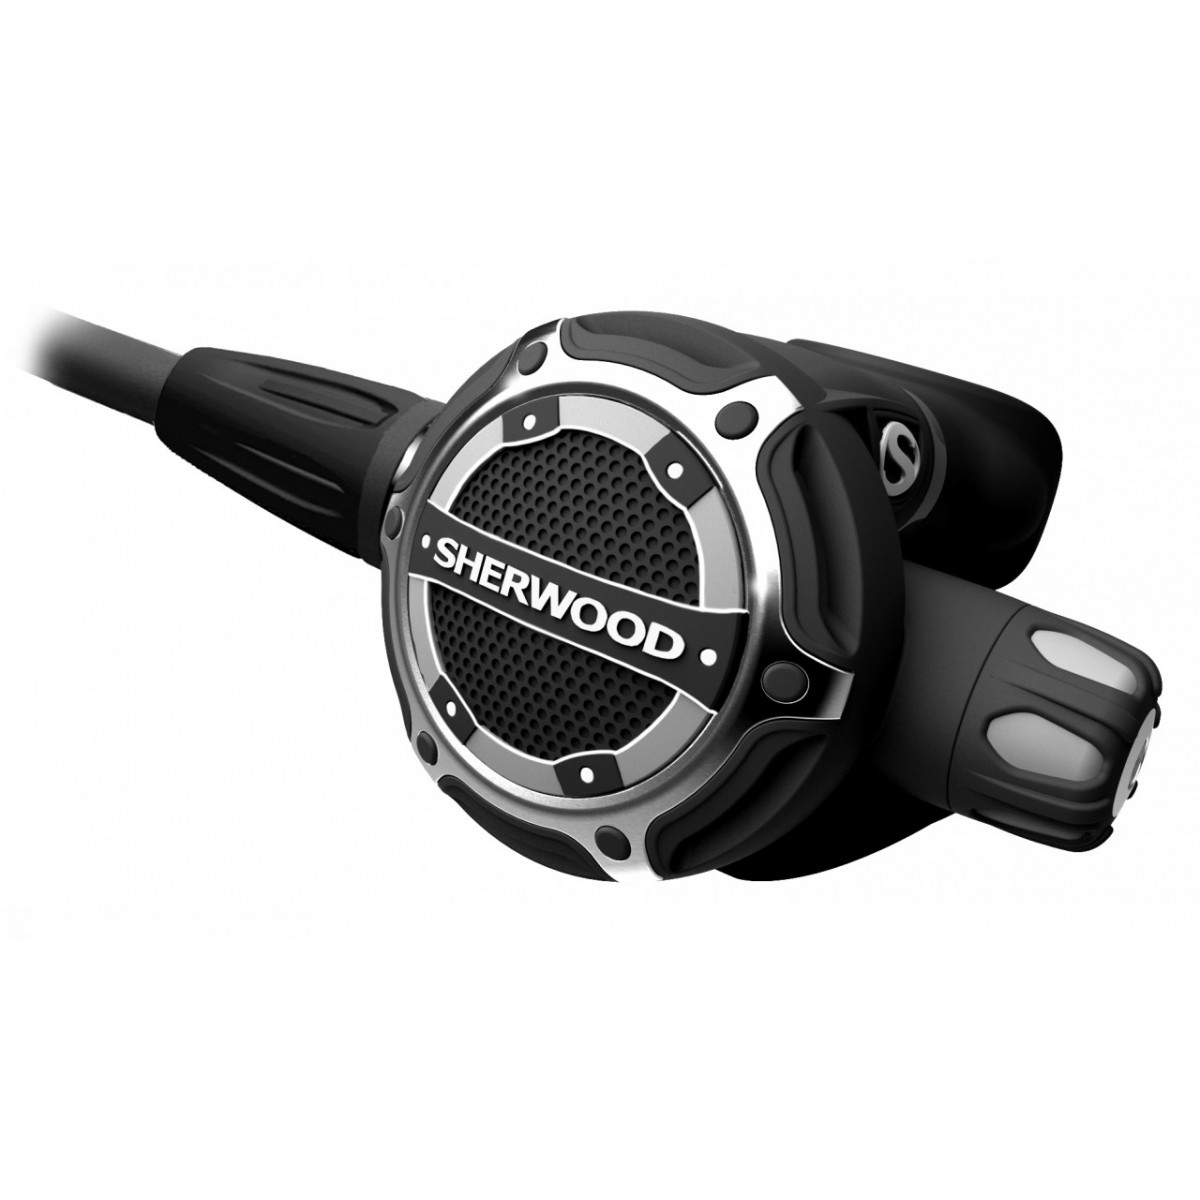 Sherwood SR2 Dive Regulator